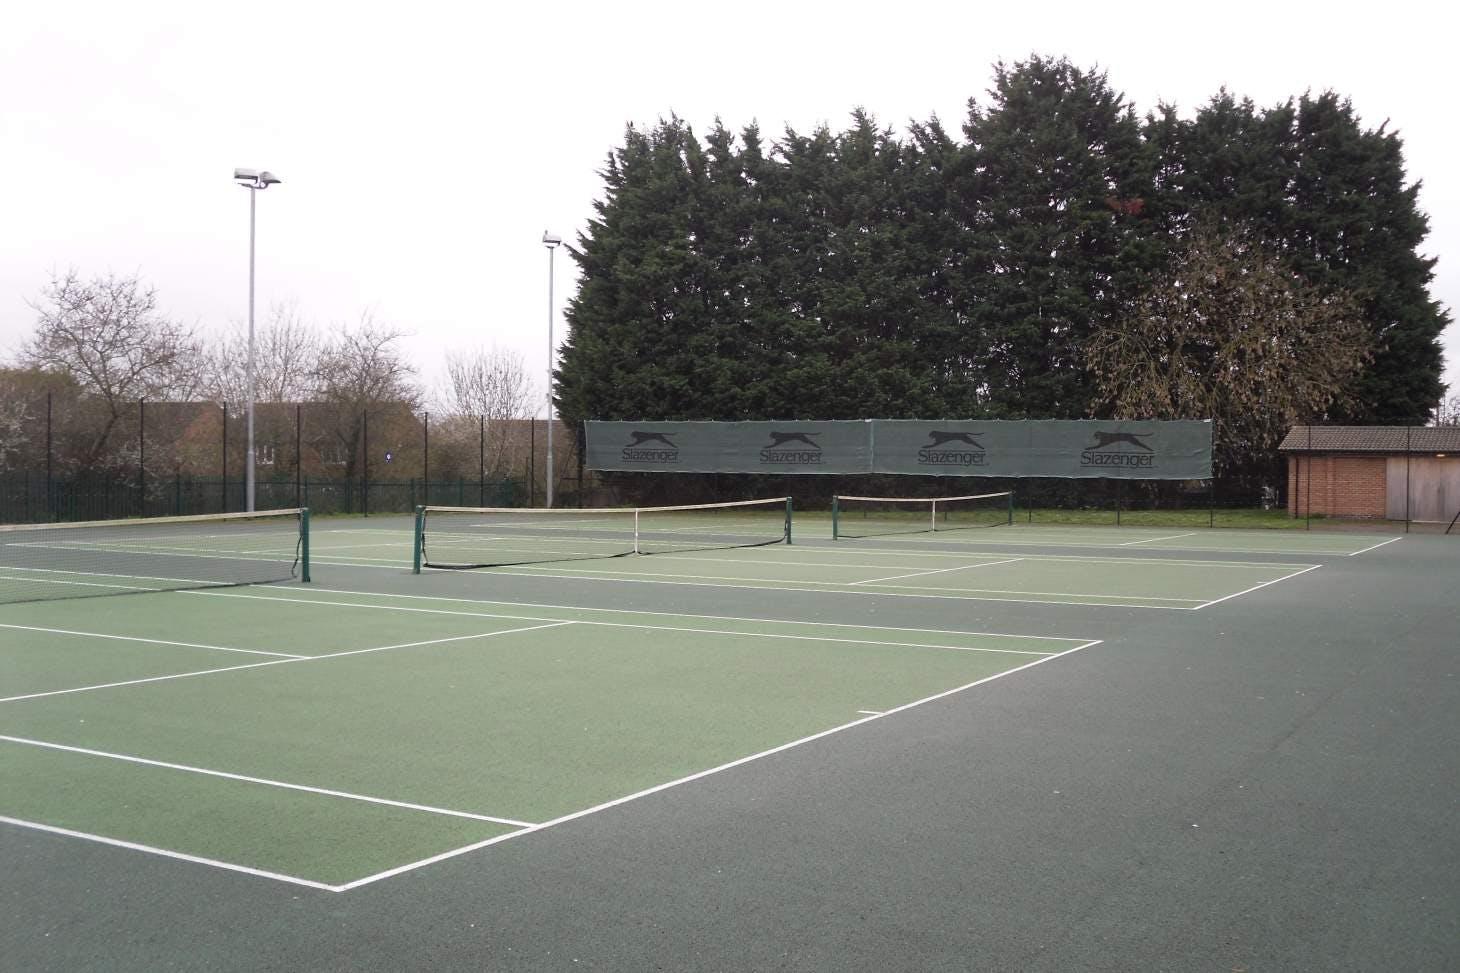 SBL Sports Centre Outdoor | Hard (macadam) tennis court